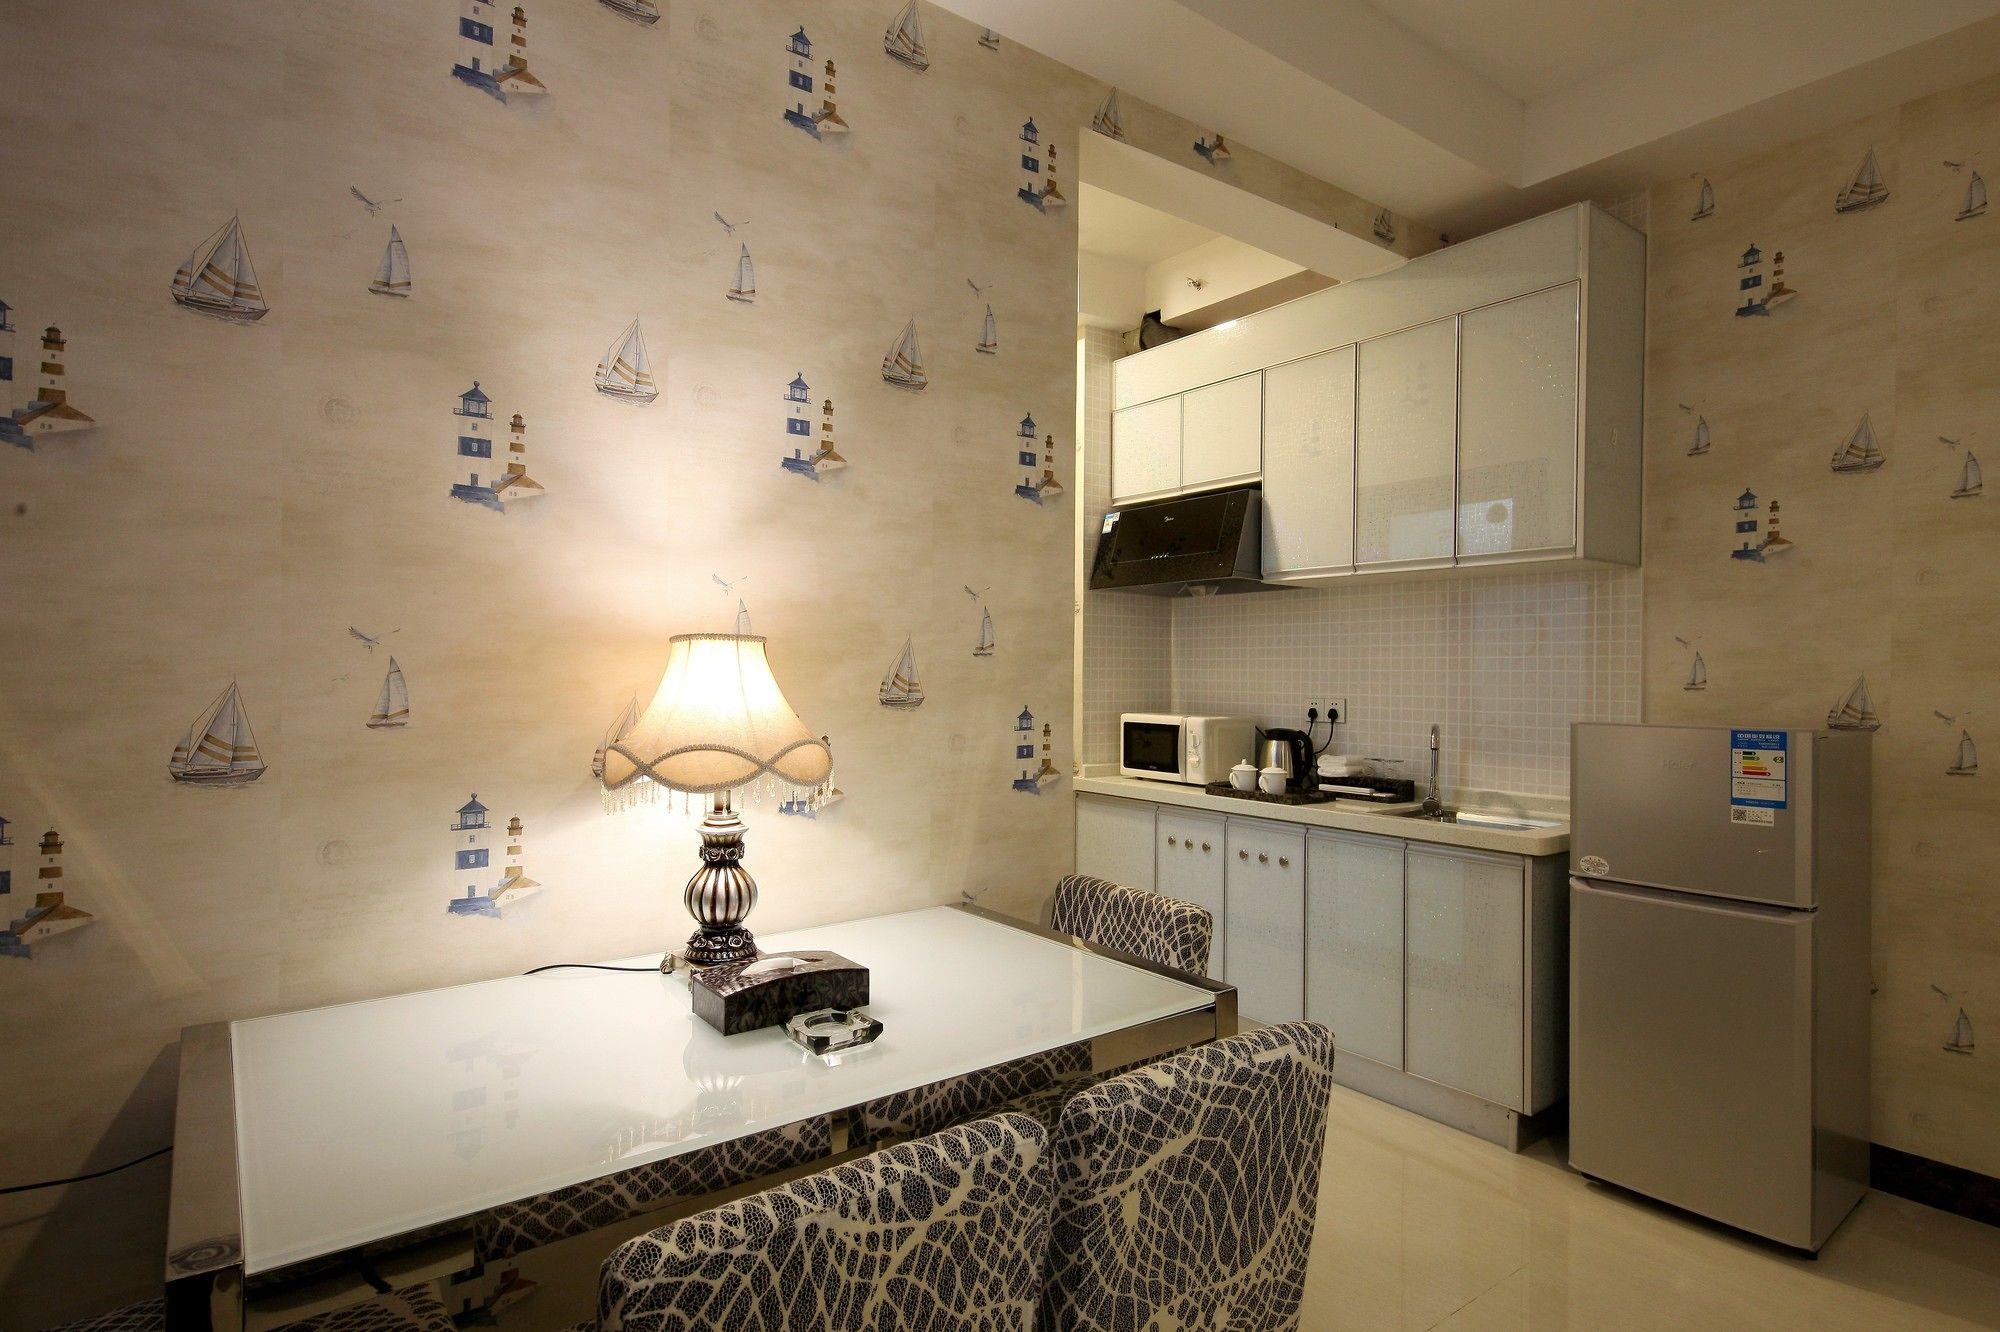 Guangzhou Heefun Apartment (گوانگژو هیفون آپارتمان)